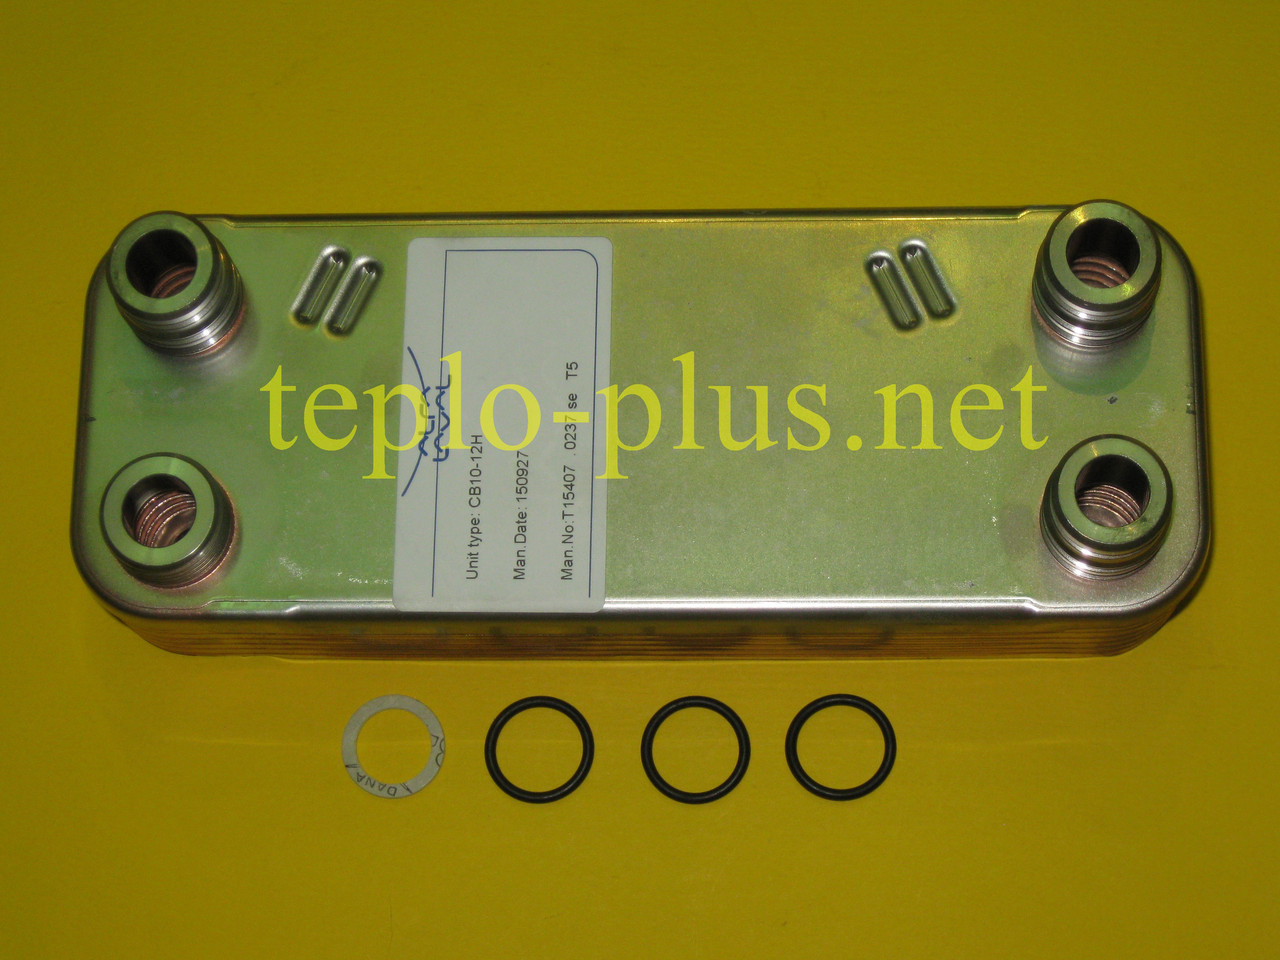 Теплообменник вторичный Alfa Laval (12 пластин) 065131 Vaillant ATMOmax, TURBOmax Pro / Plus, фото 2